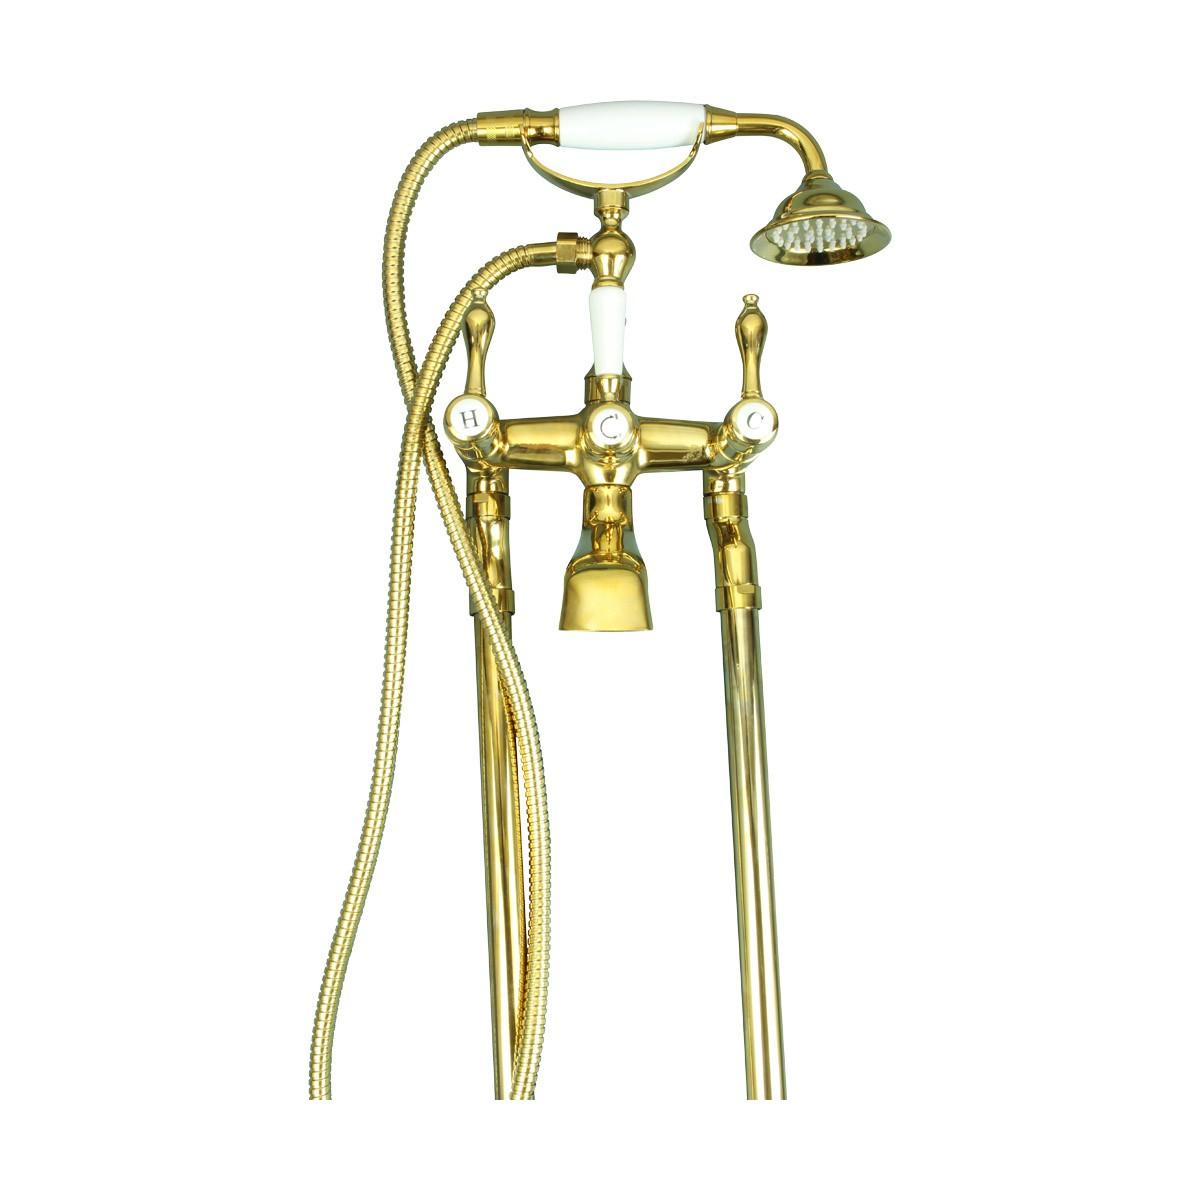 Freestanding Tub Faucet Teardrop Telephone Shower Gold PVD Tub Shower Shower Faucet Tub Shower Faucet